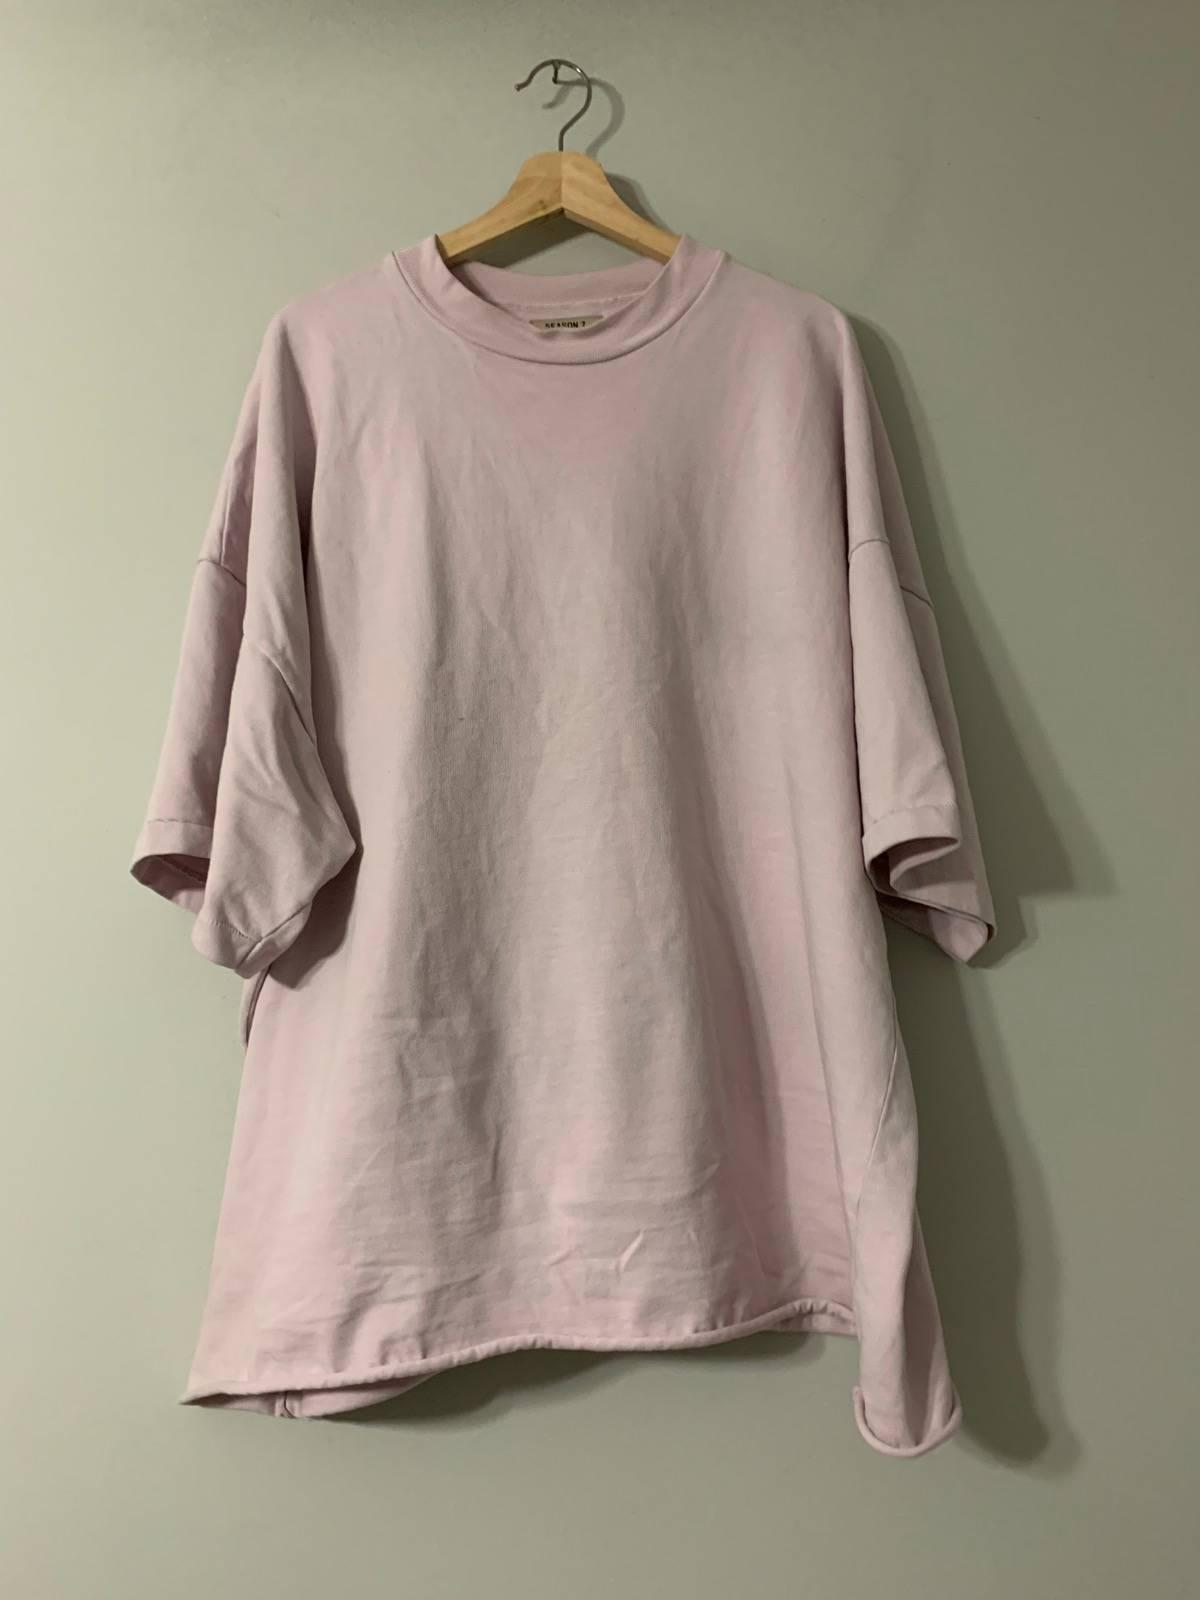 adidas 7 shirt